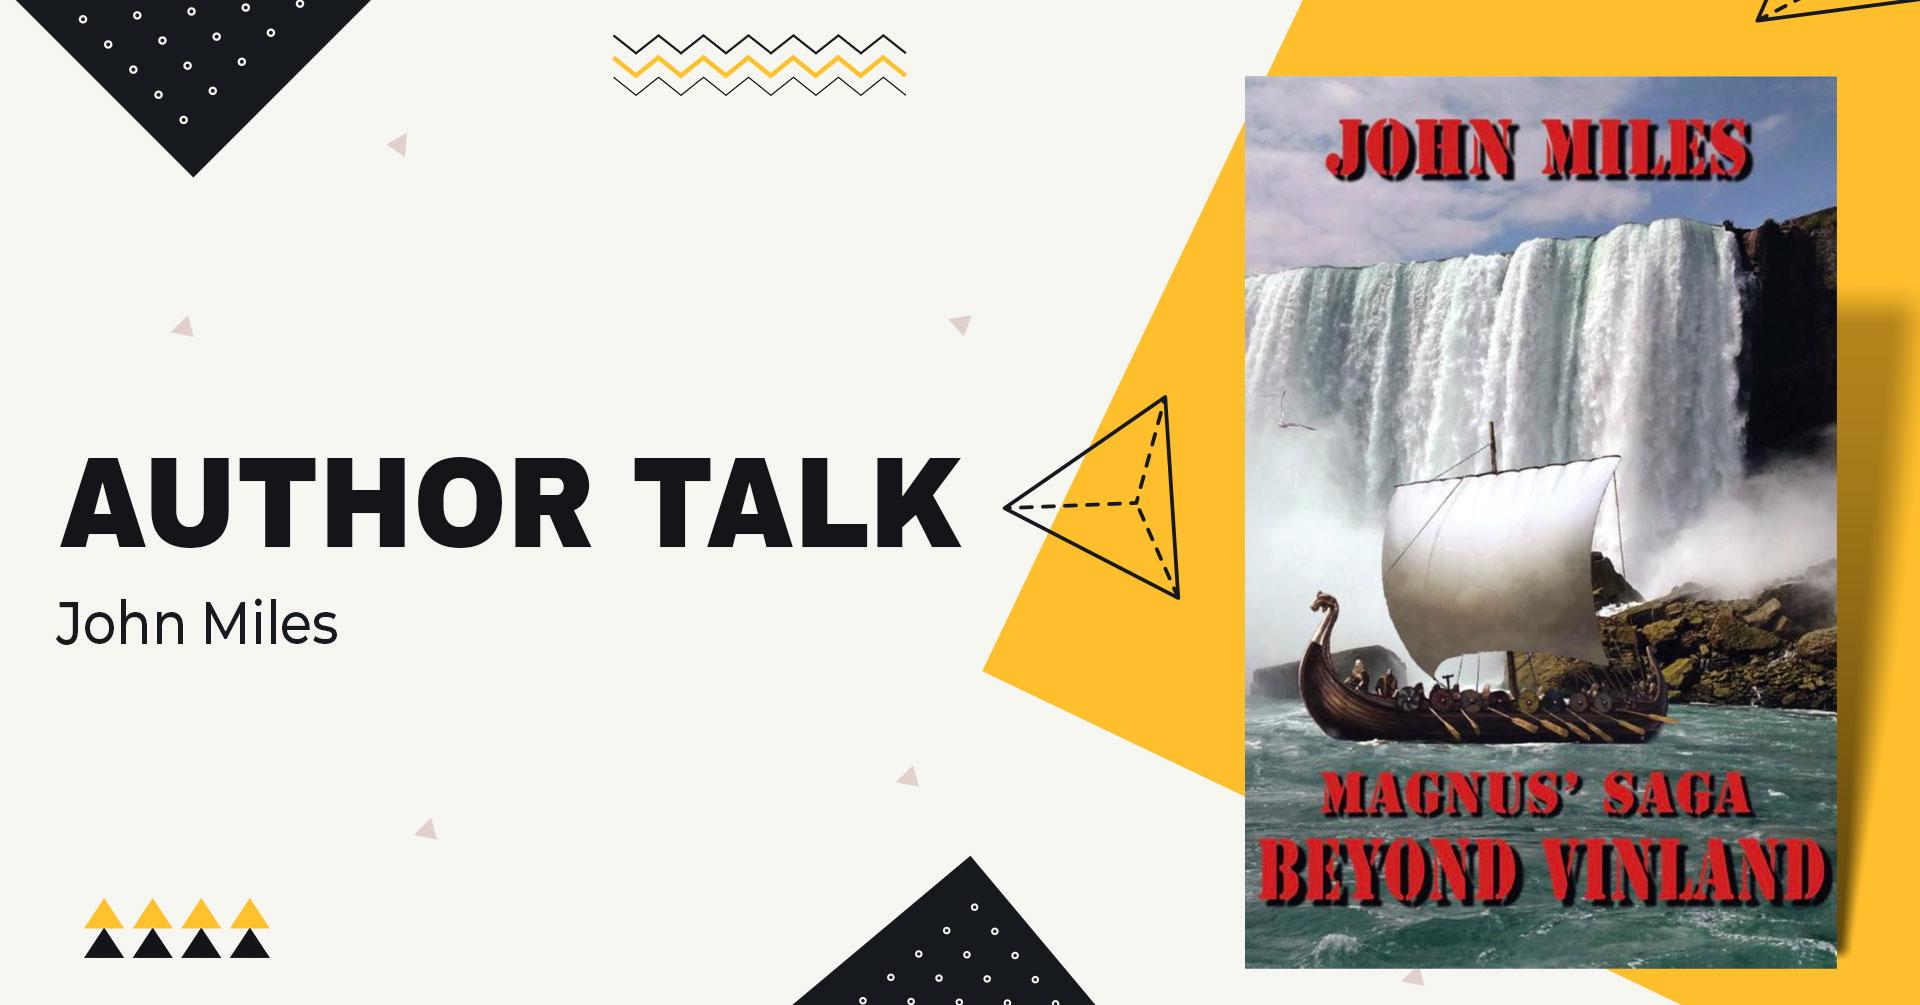 author talk john miles